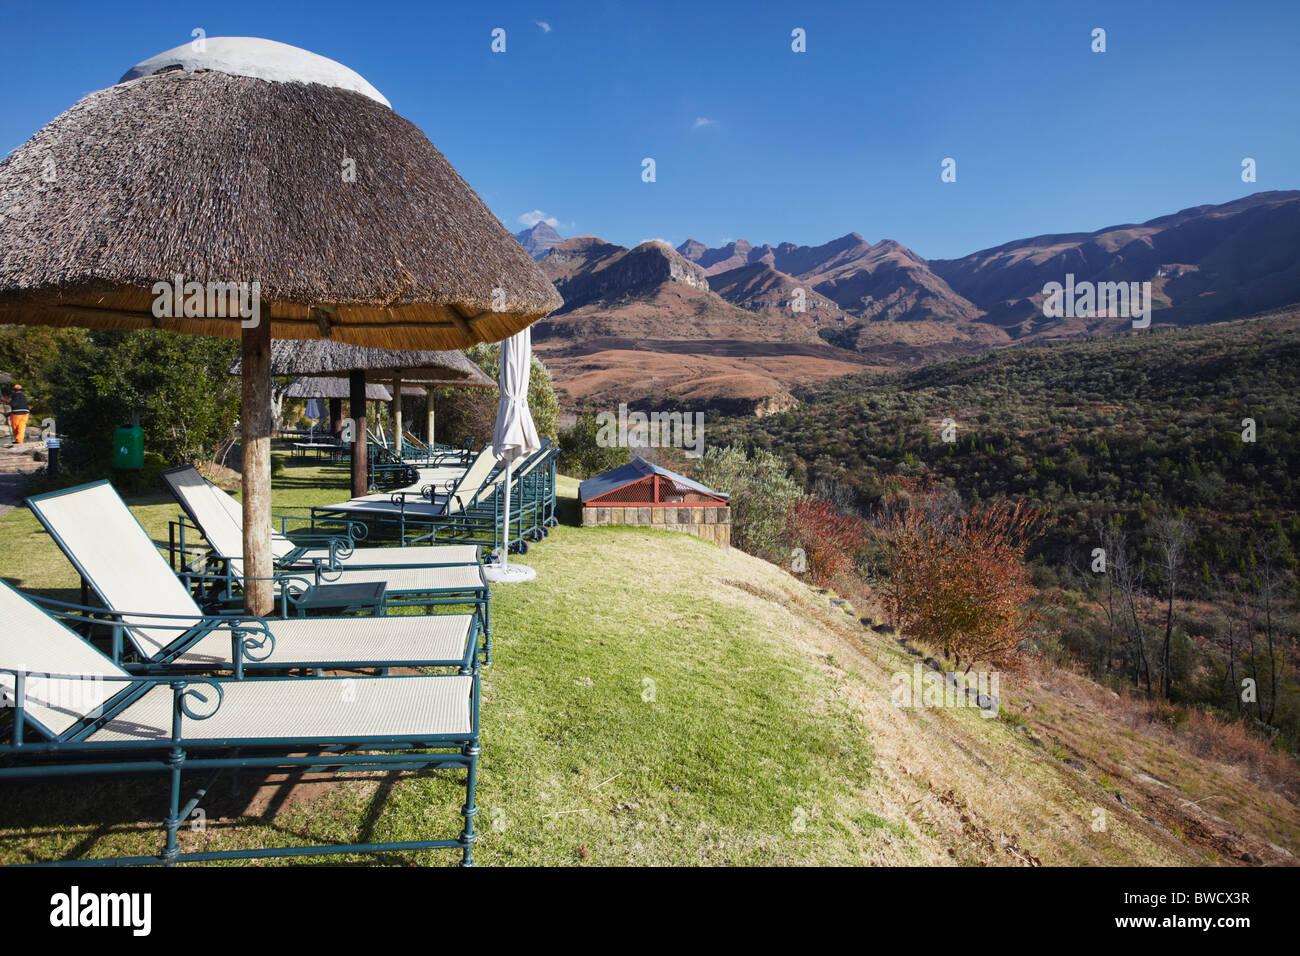 Sun loungers at Cathedral Peak Hotel, Cathedral Peak Nature Reserve, Ukhahlamba-Drakensberg Park, KwaZulu-Natal, - Stock Image